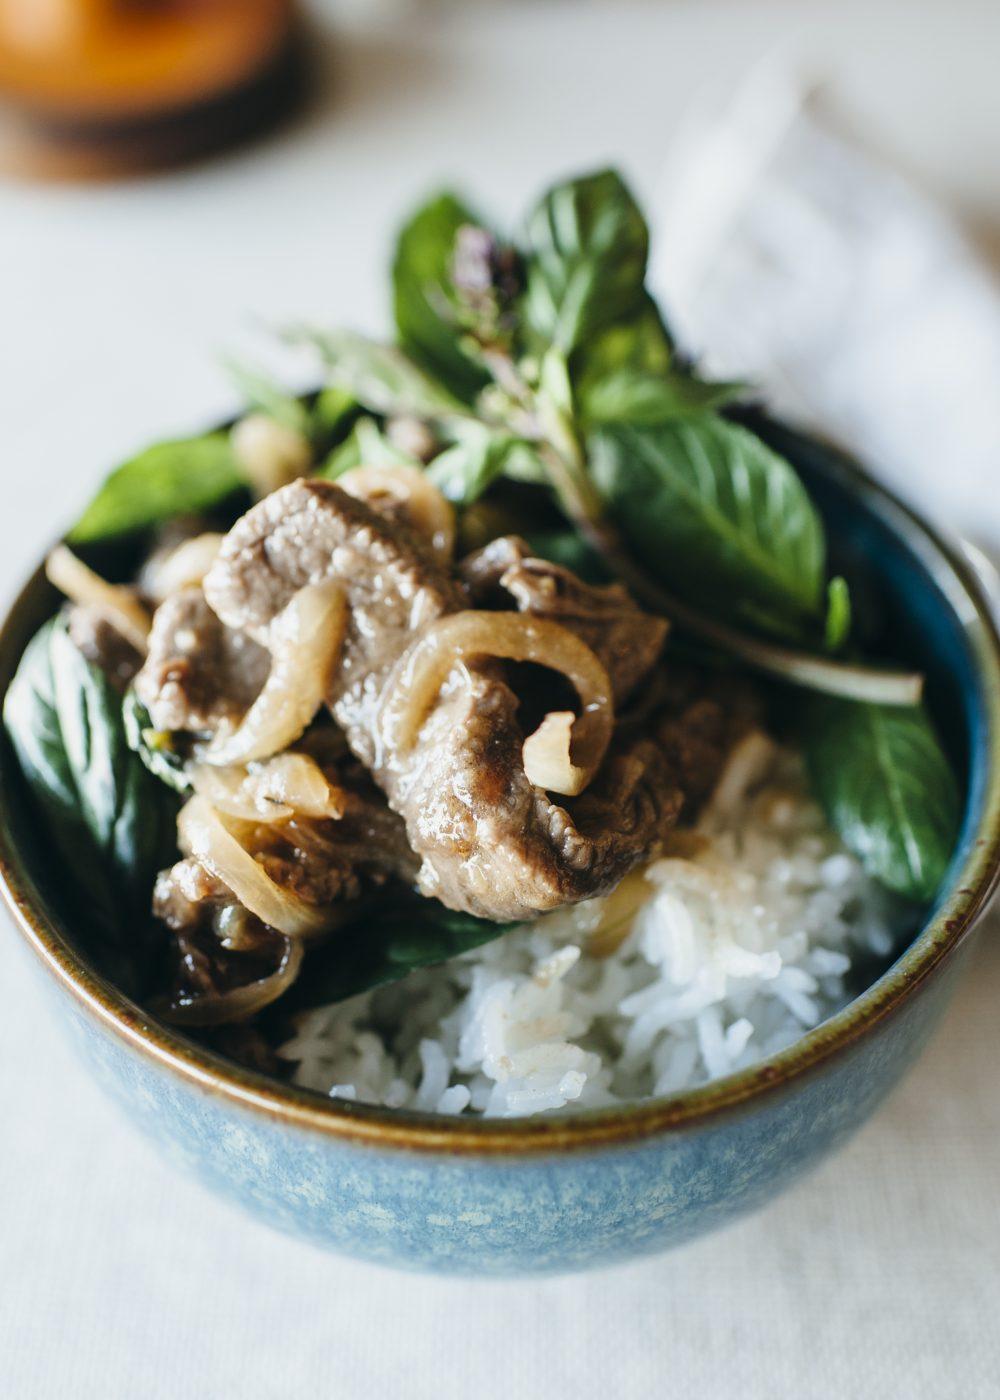 Thai Cookery – A Celebration Of The Senses